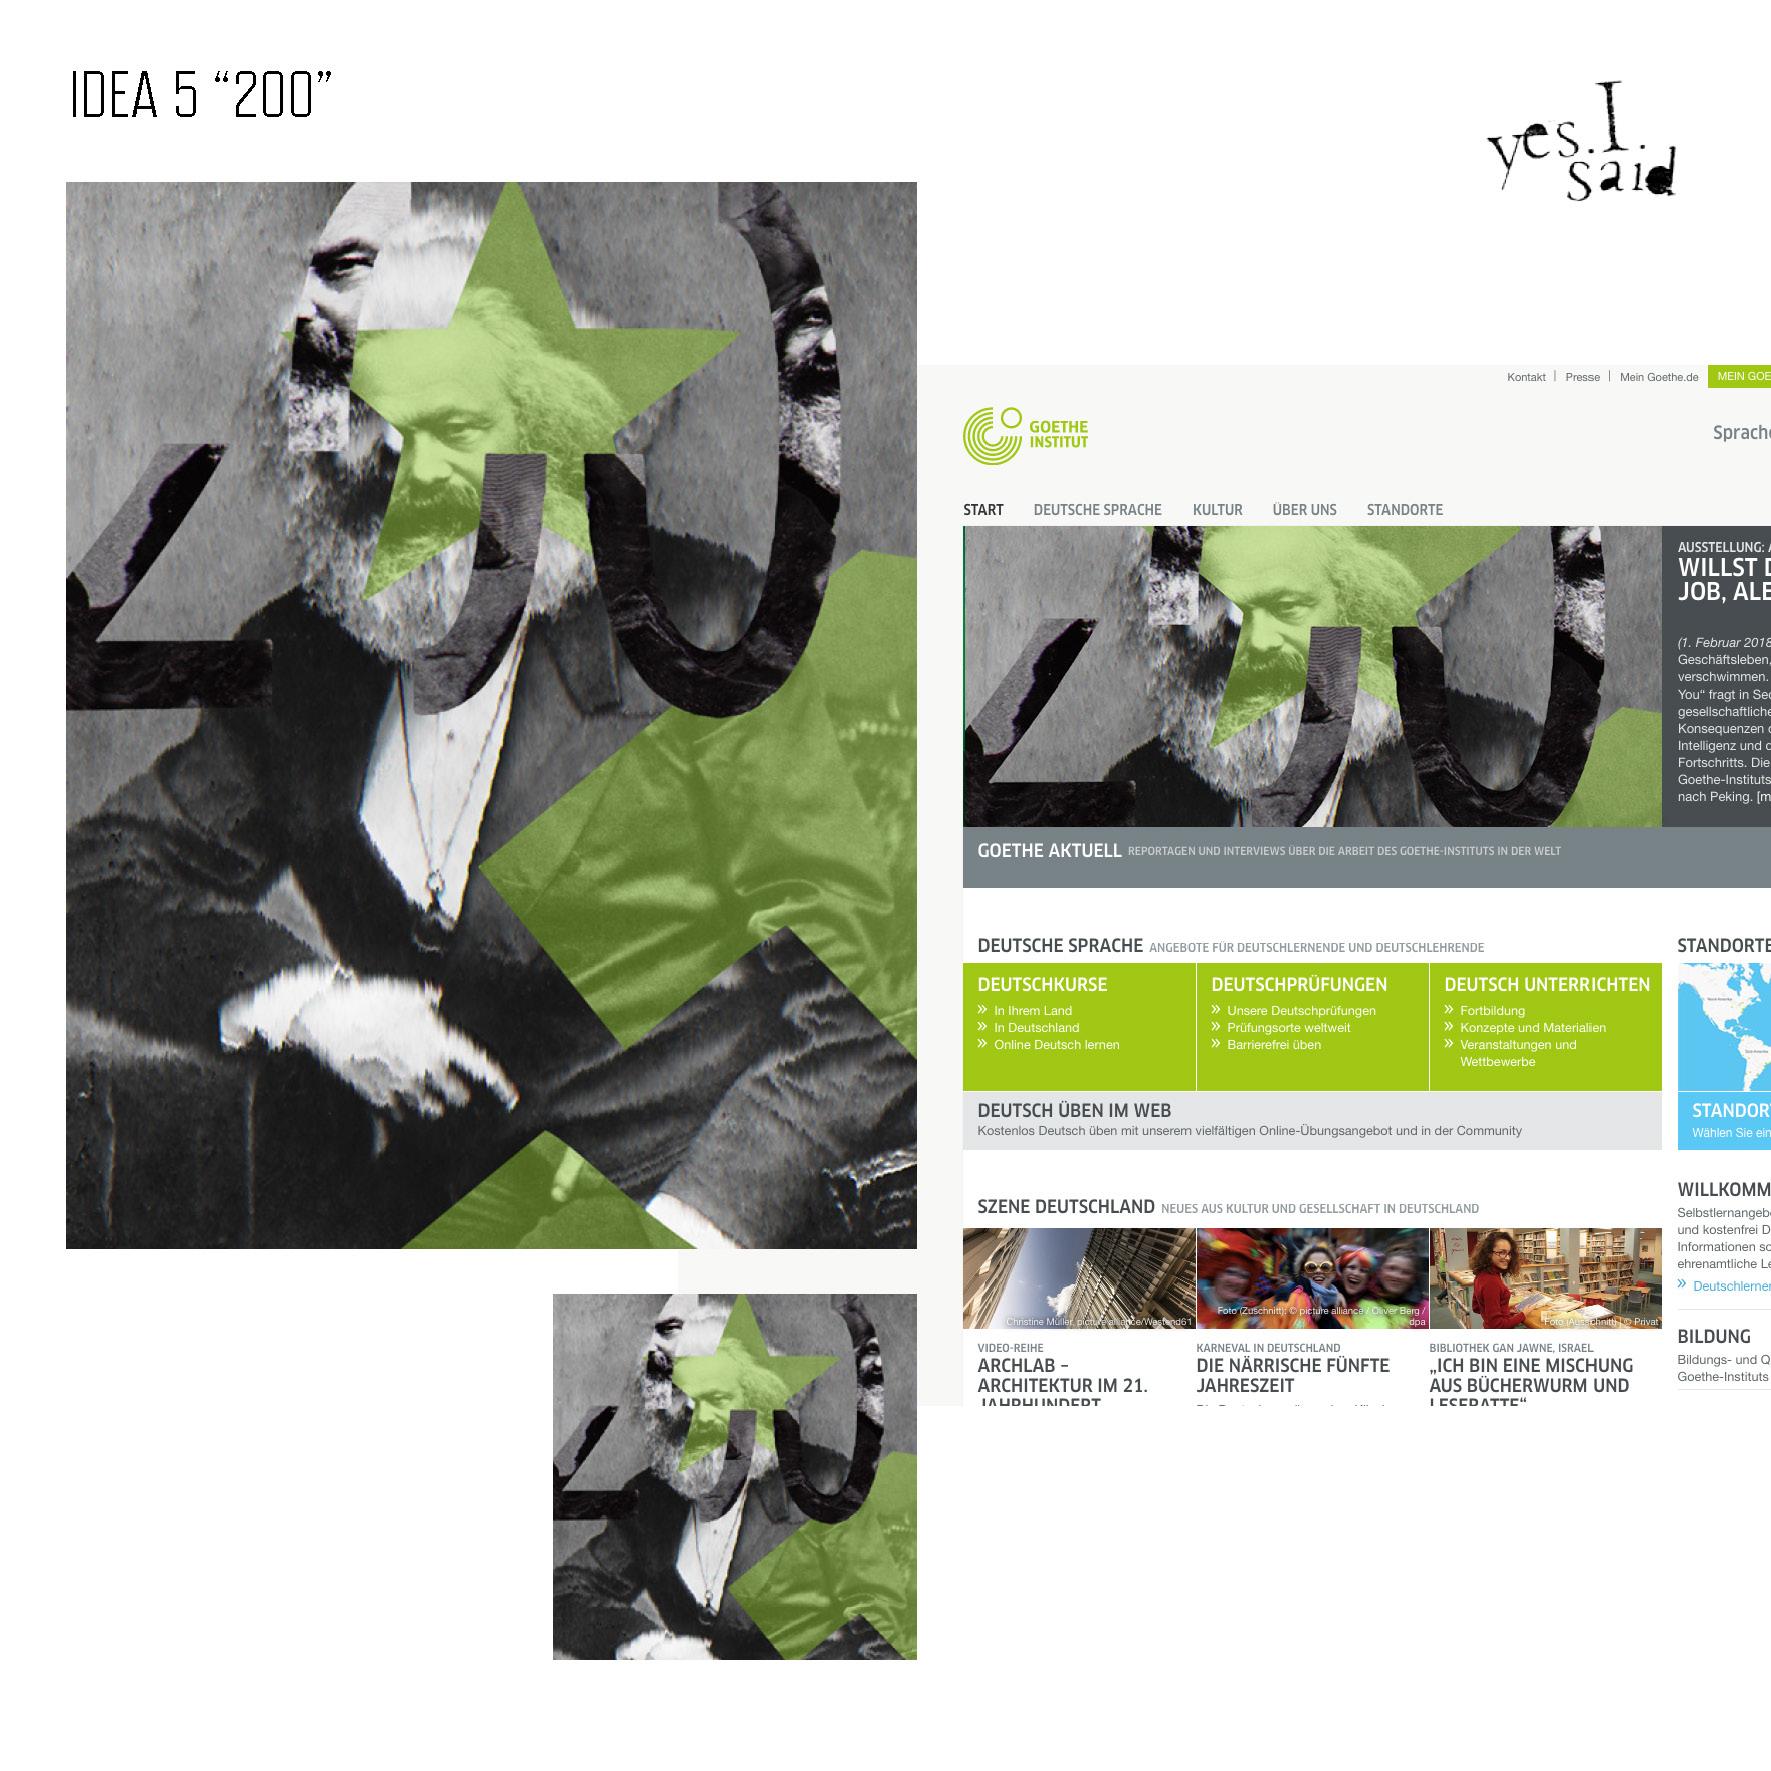 GI-MarxNow_imagemark-firstround__Page_6.jpg